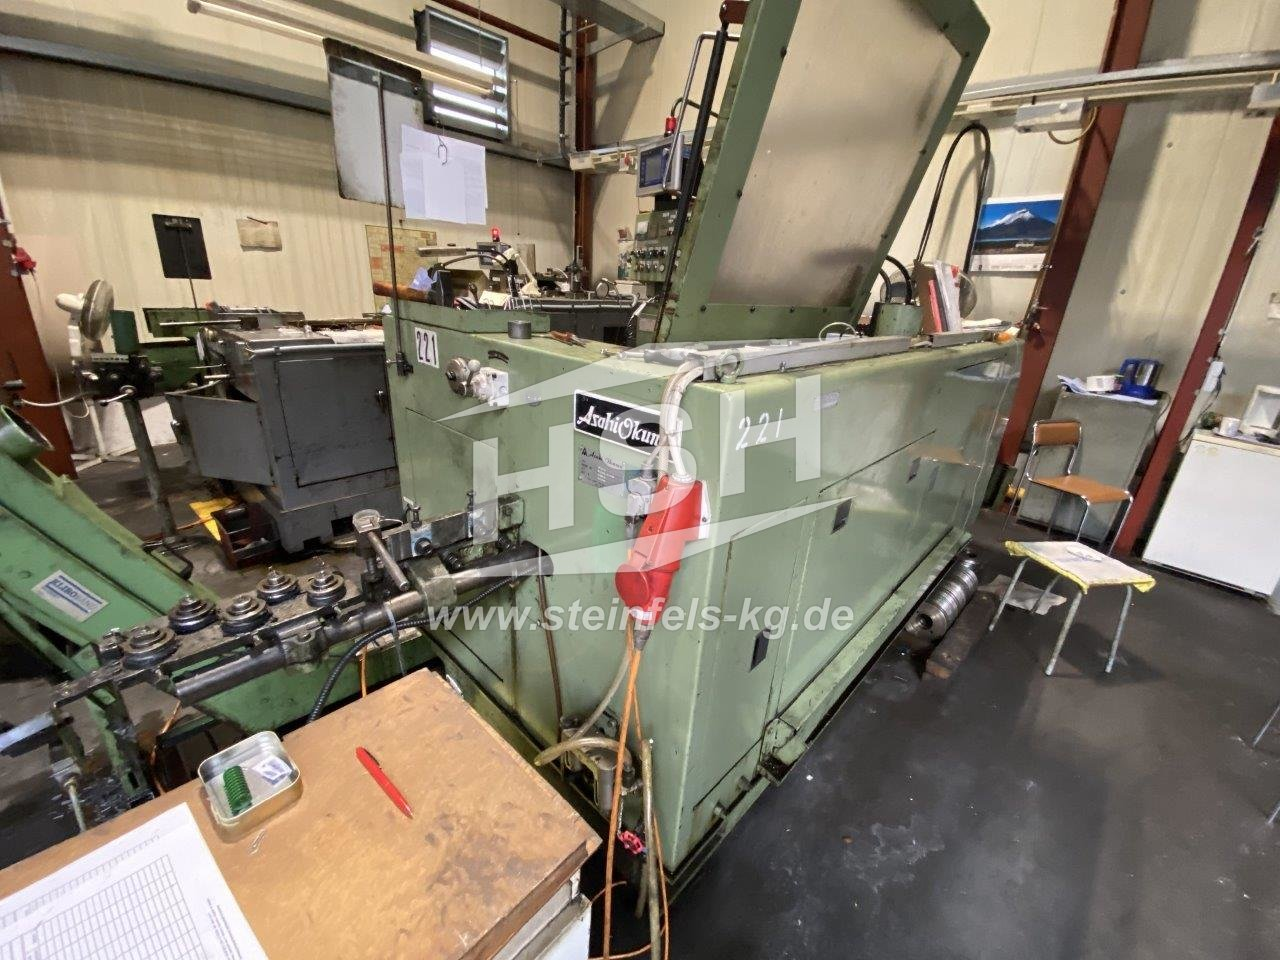 M08I/8441 – ASAHI-OKUMA – AOT-675 – 1988 – 7 mm